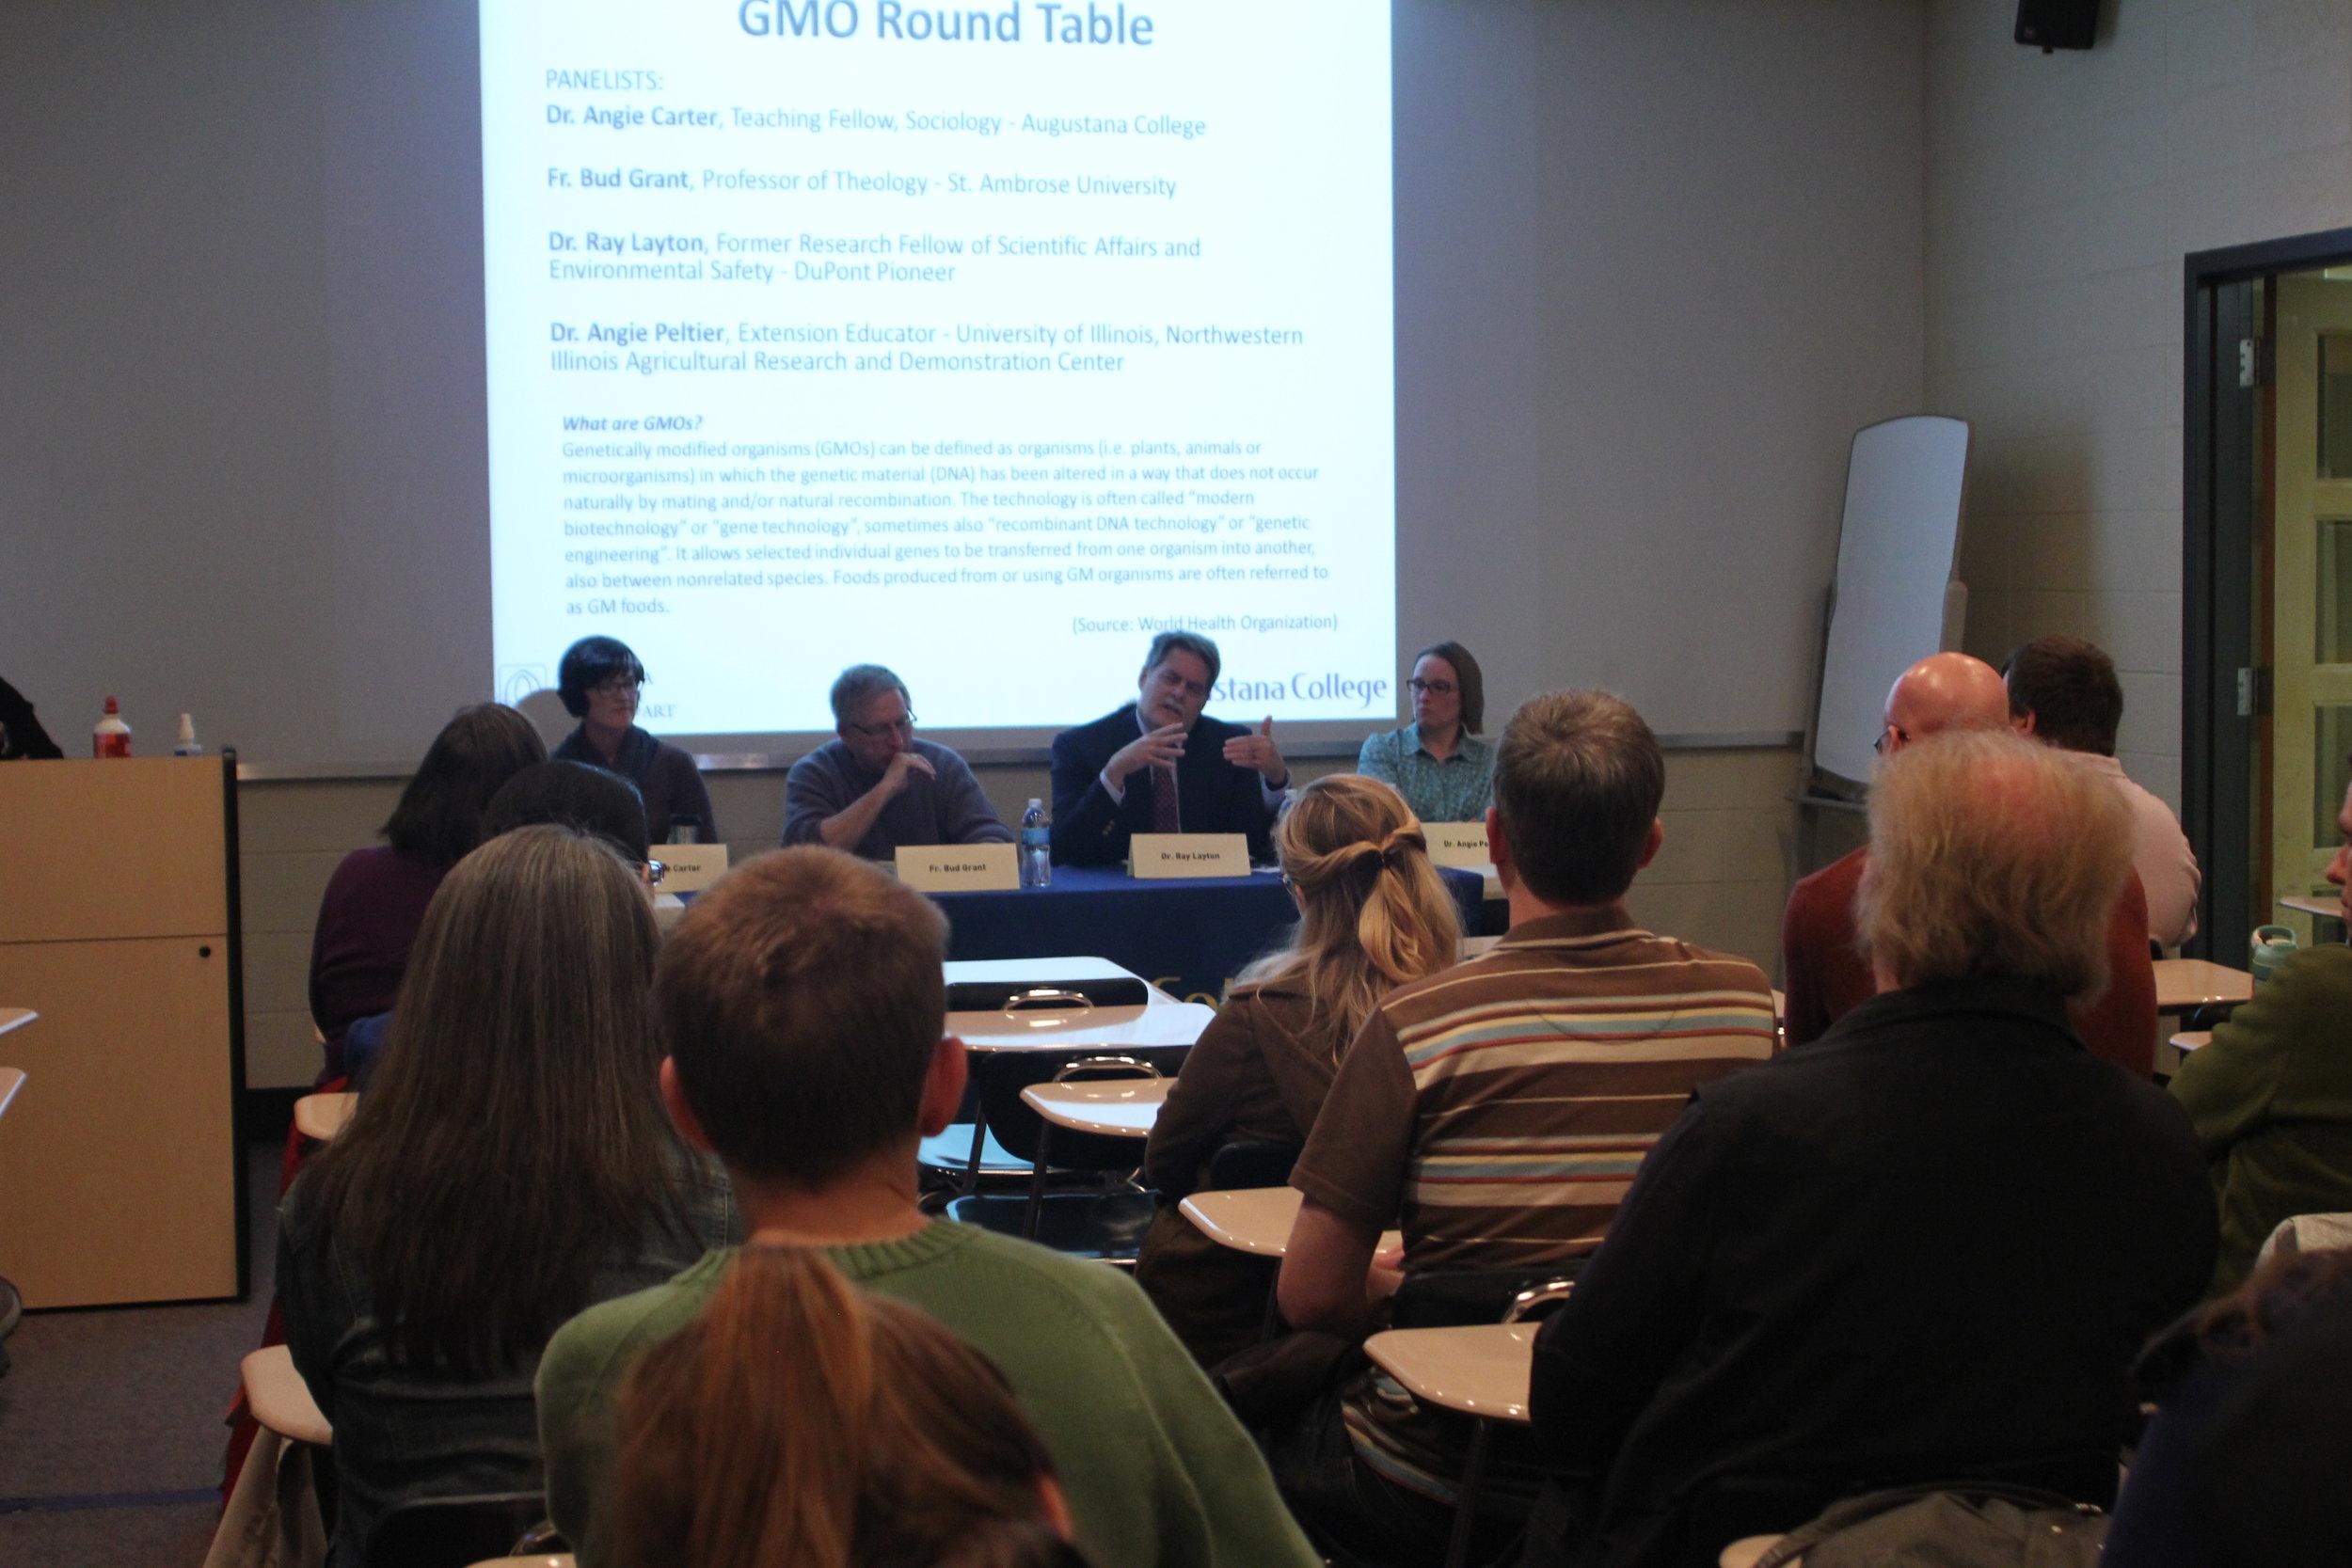 GMO Roundtable Panel